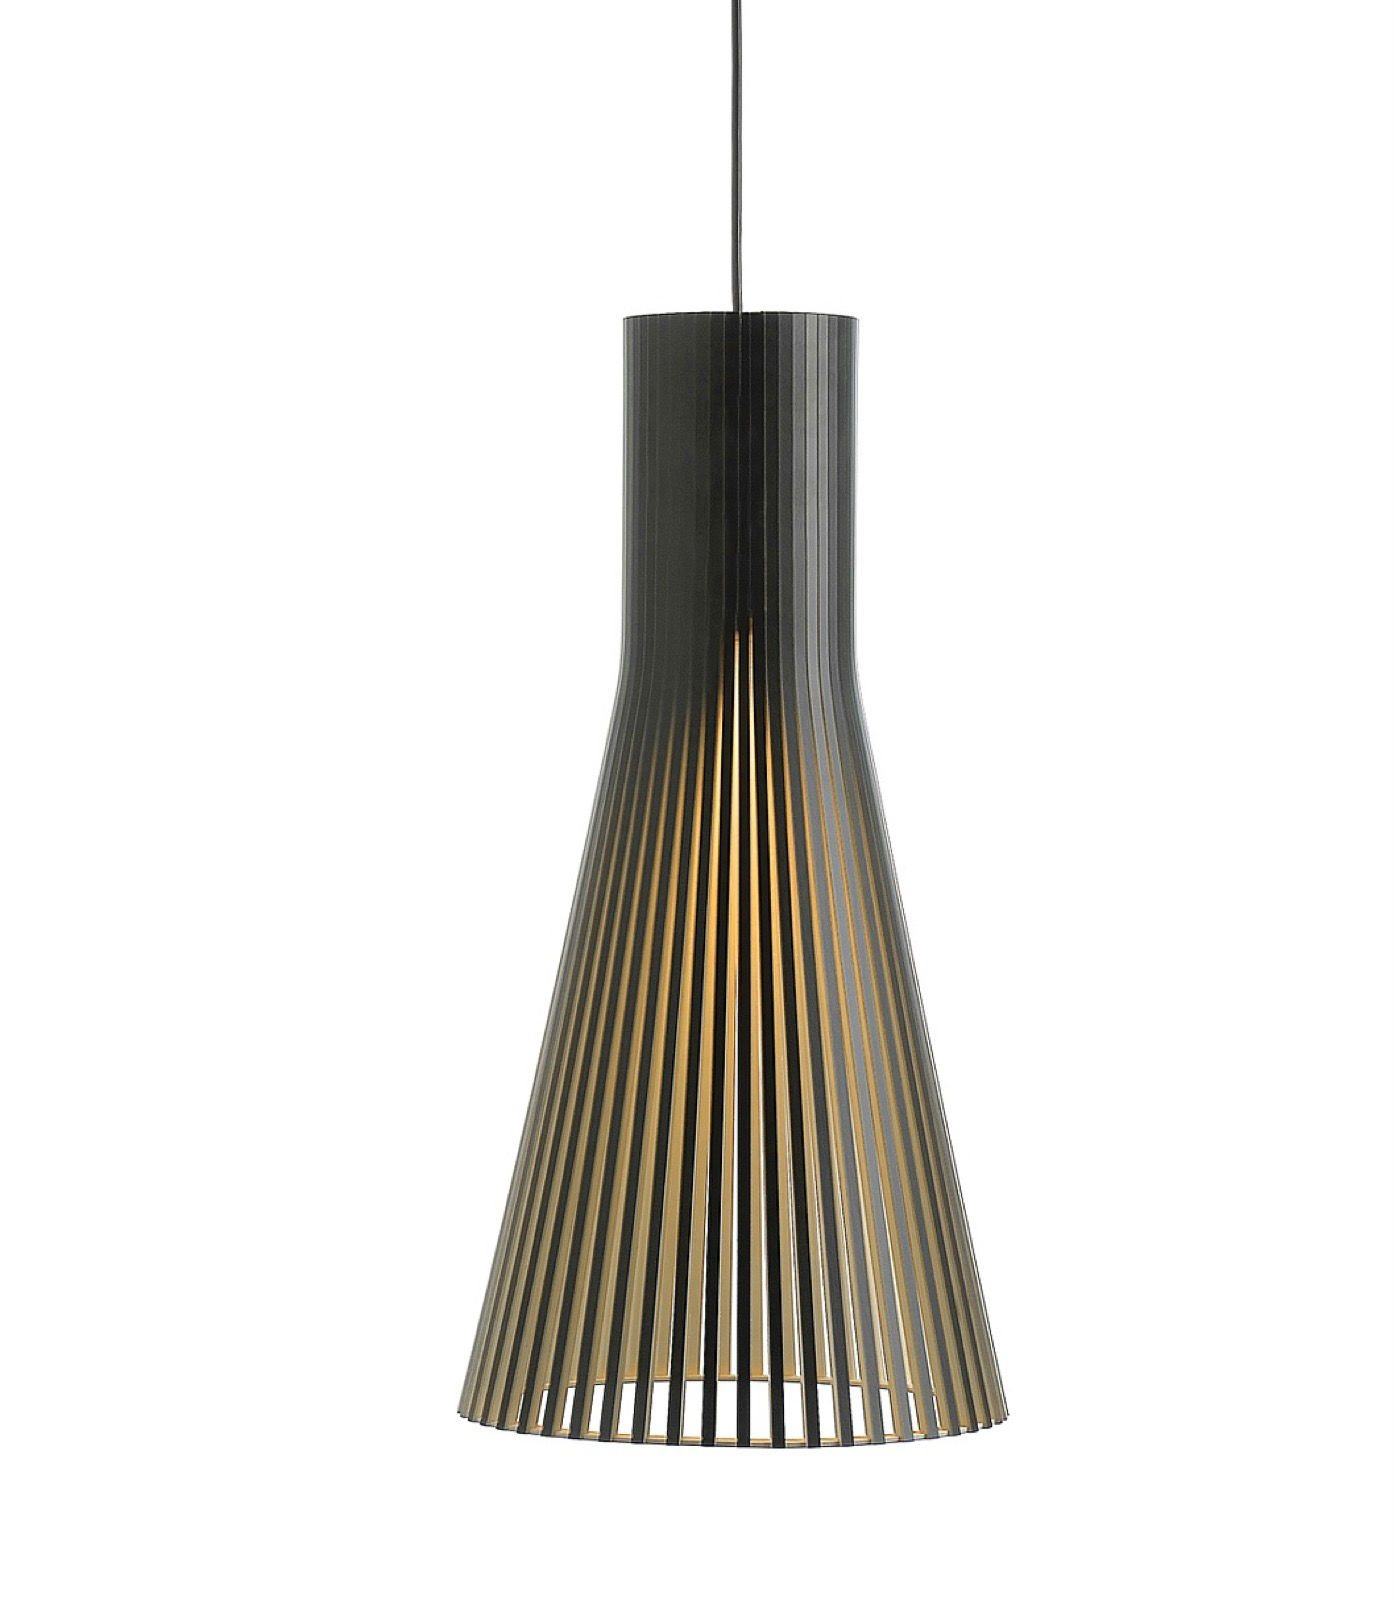 Secto Secto 4200 hanglamp   Matser Wageningen